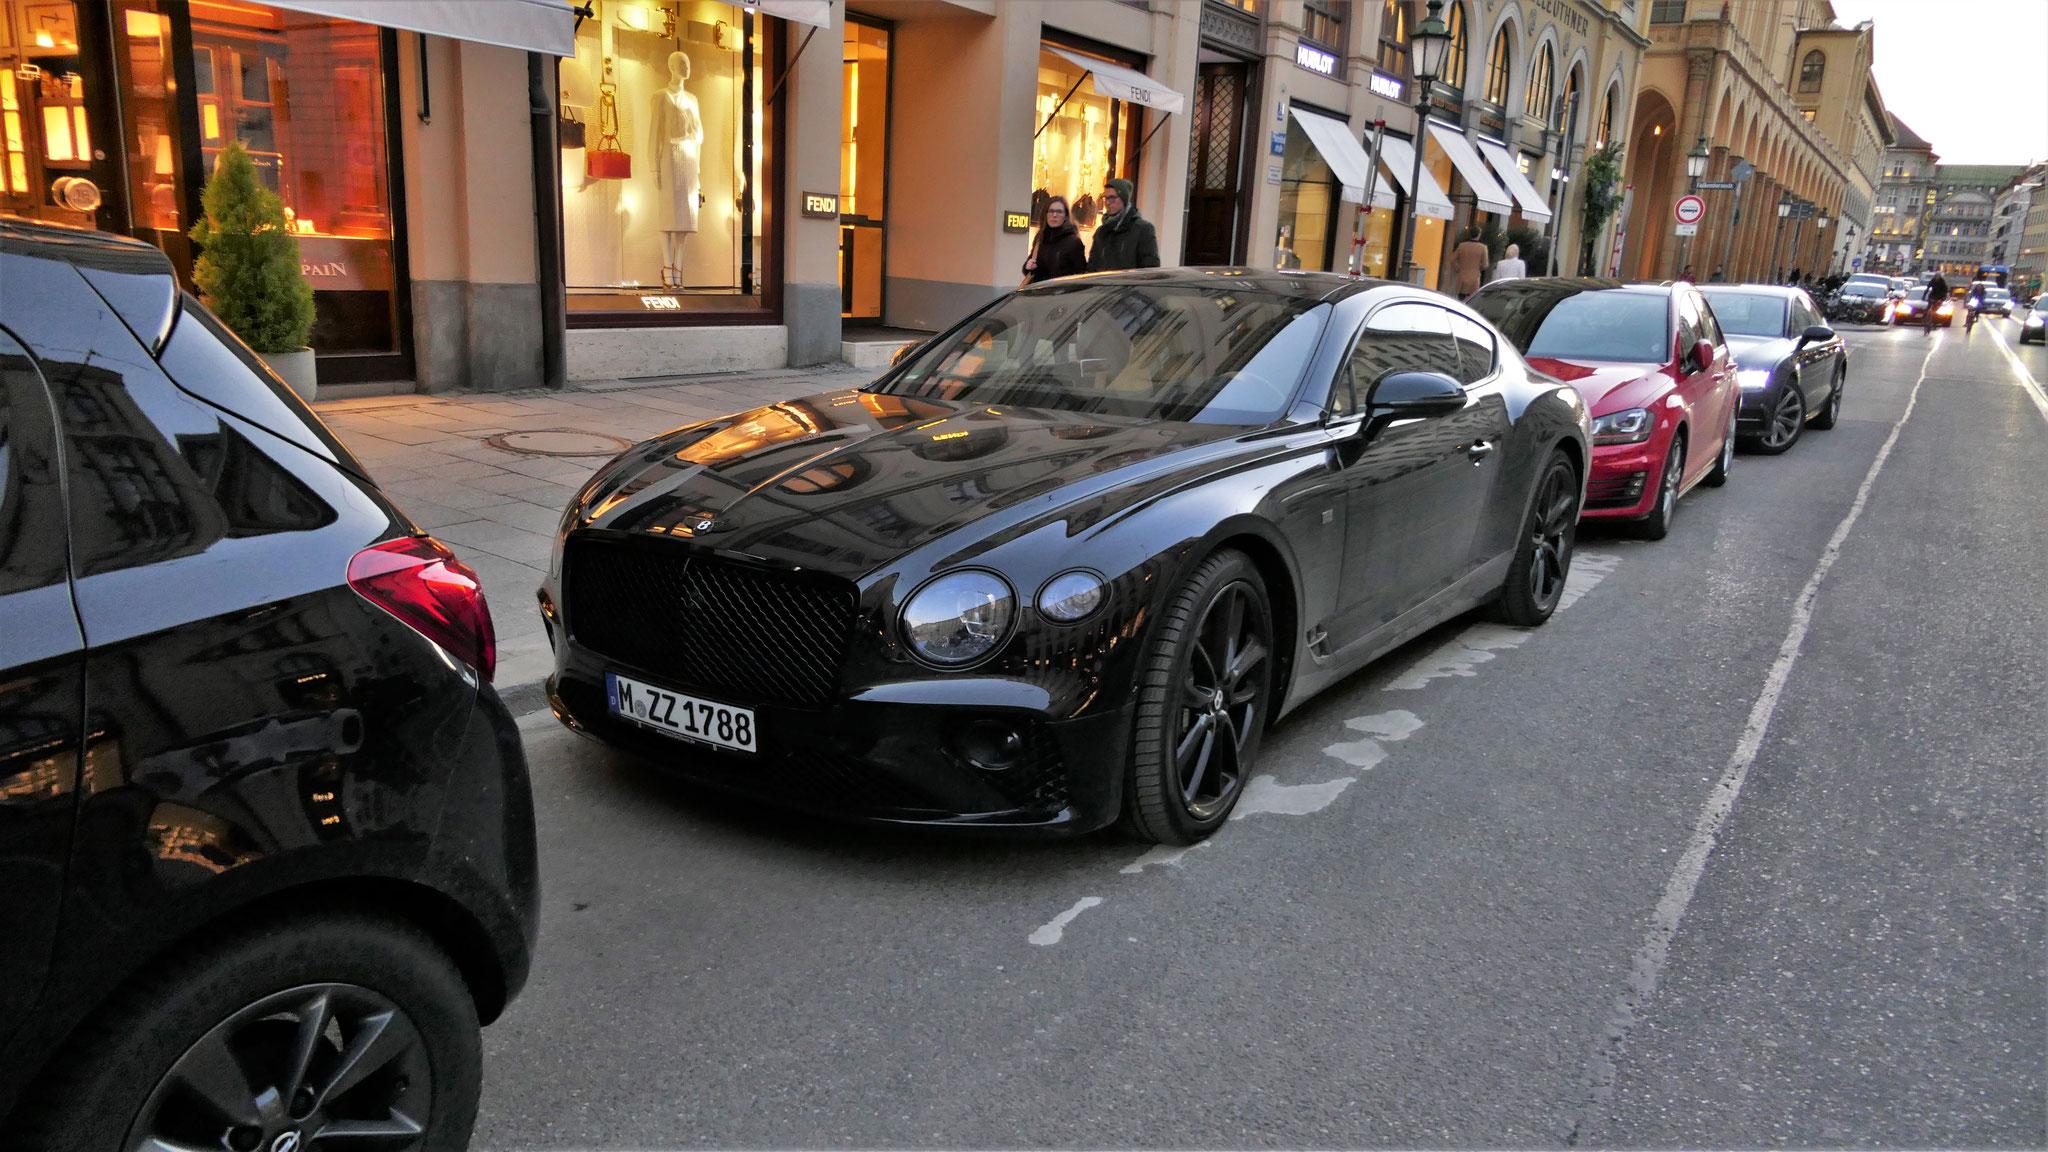 Bentley Continental GT Edition 1 - M-ZZ-1788